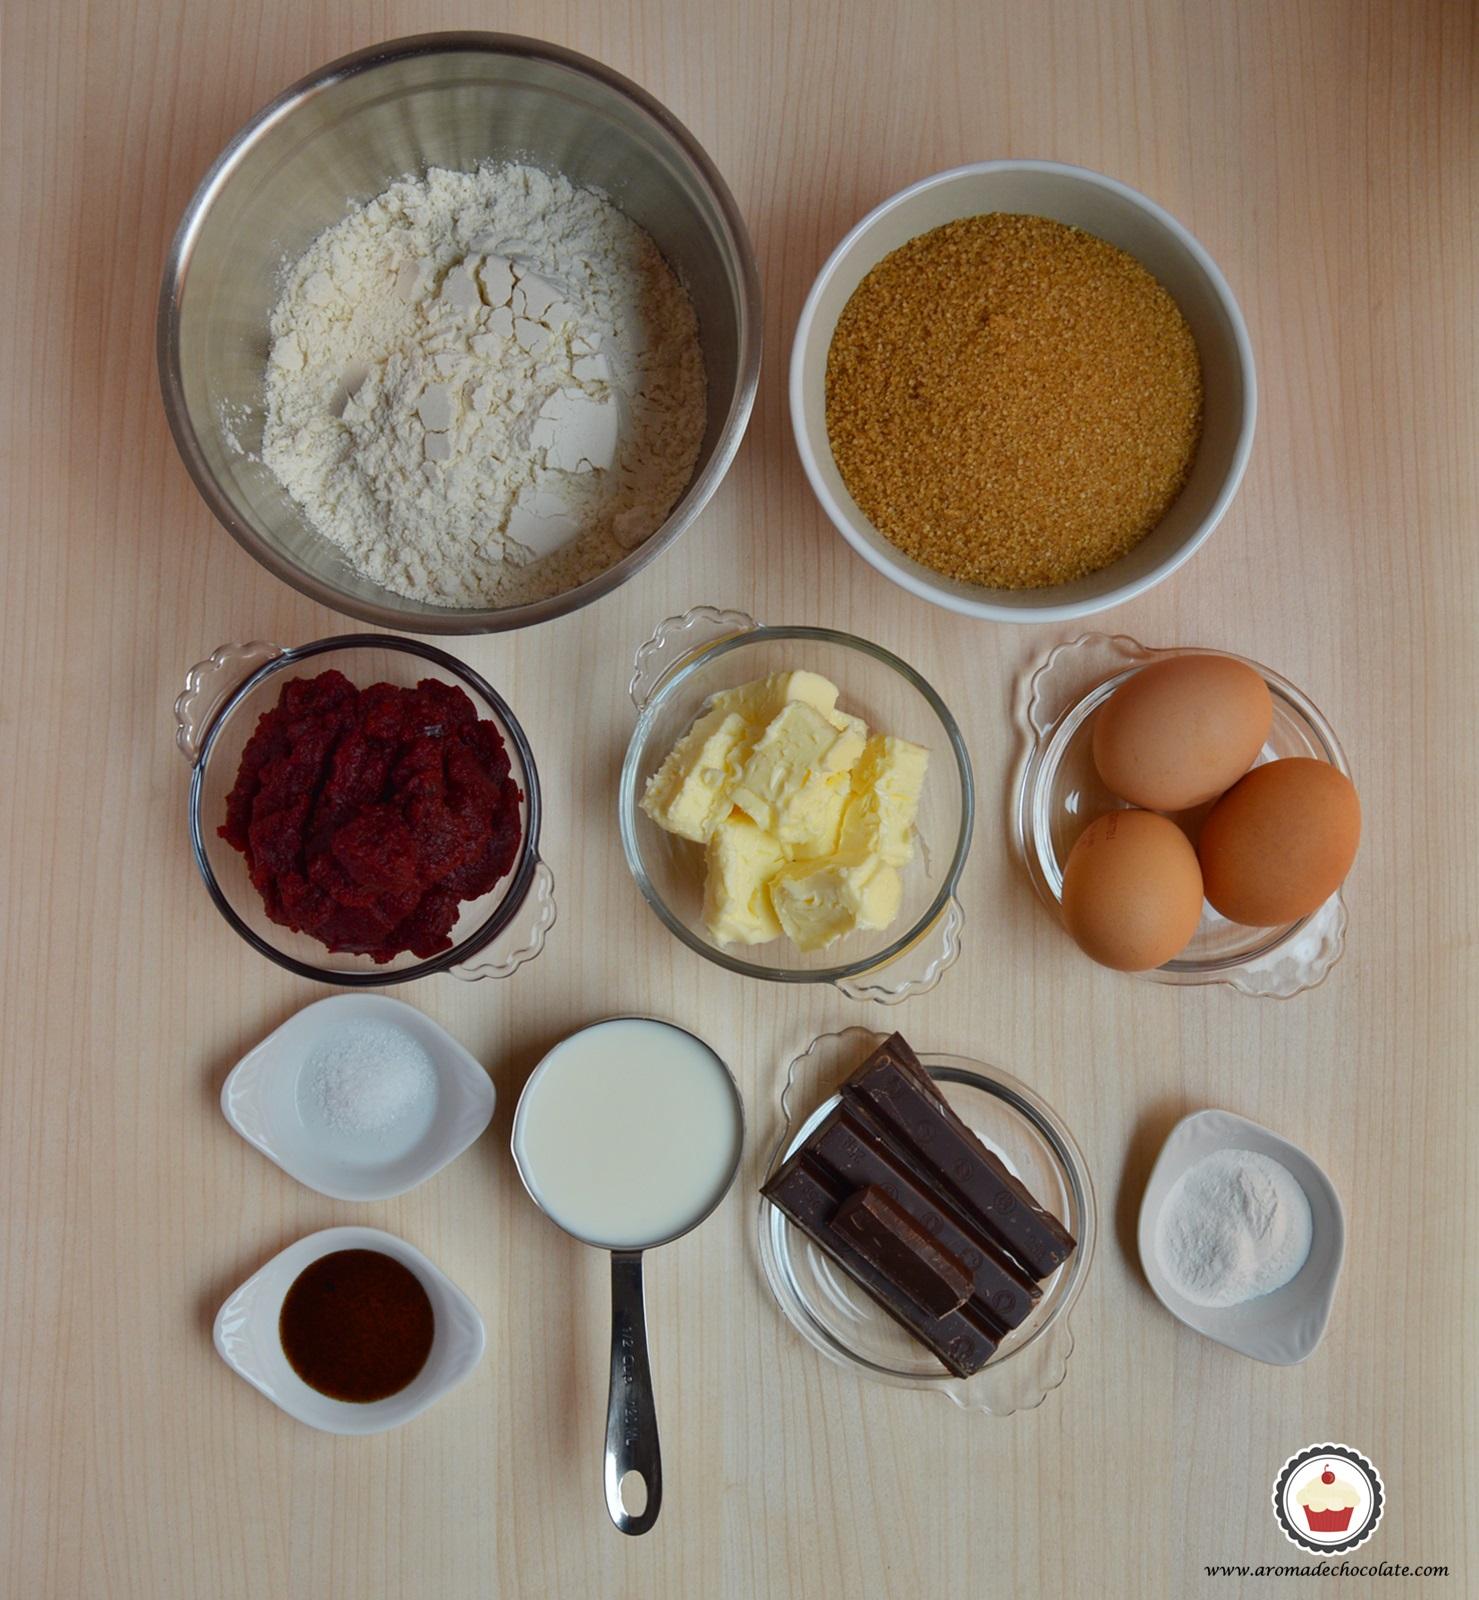 Ingredientes Beet Chocolate Naked cake. Aroma de chocolate